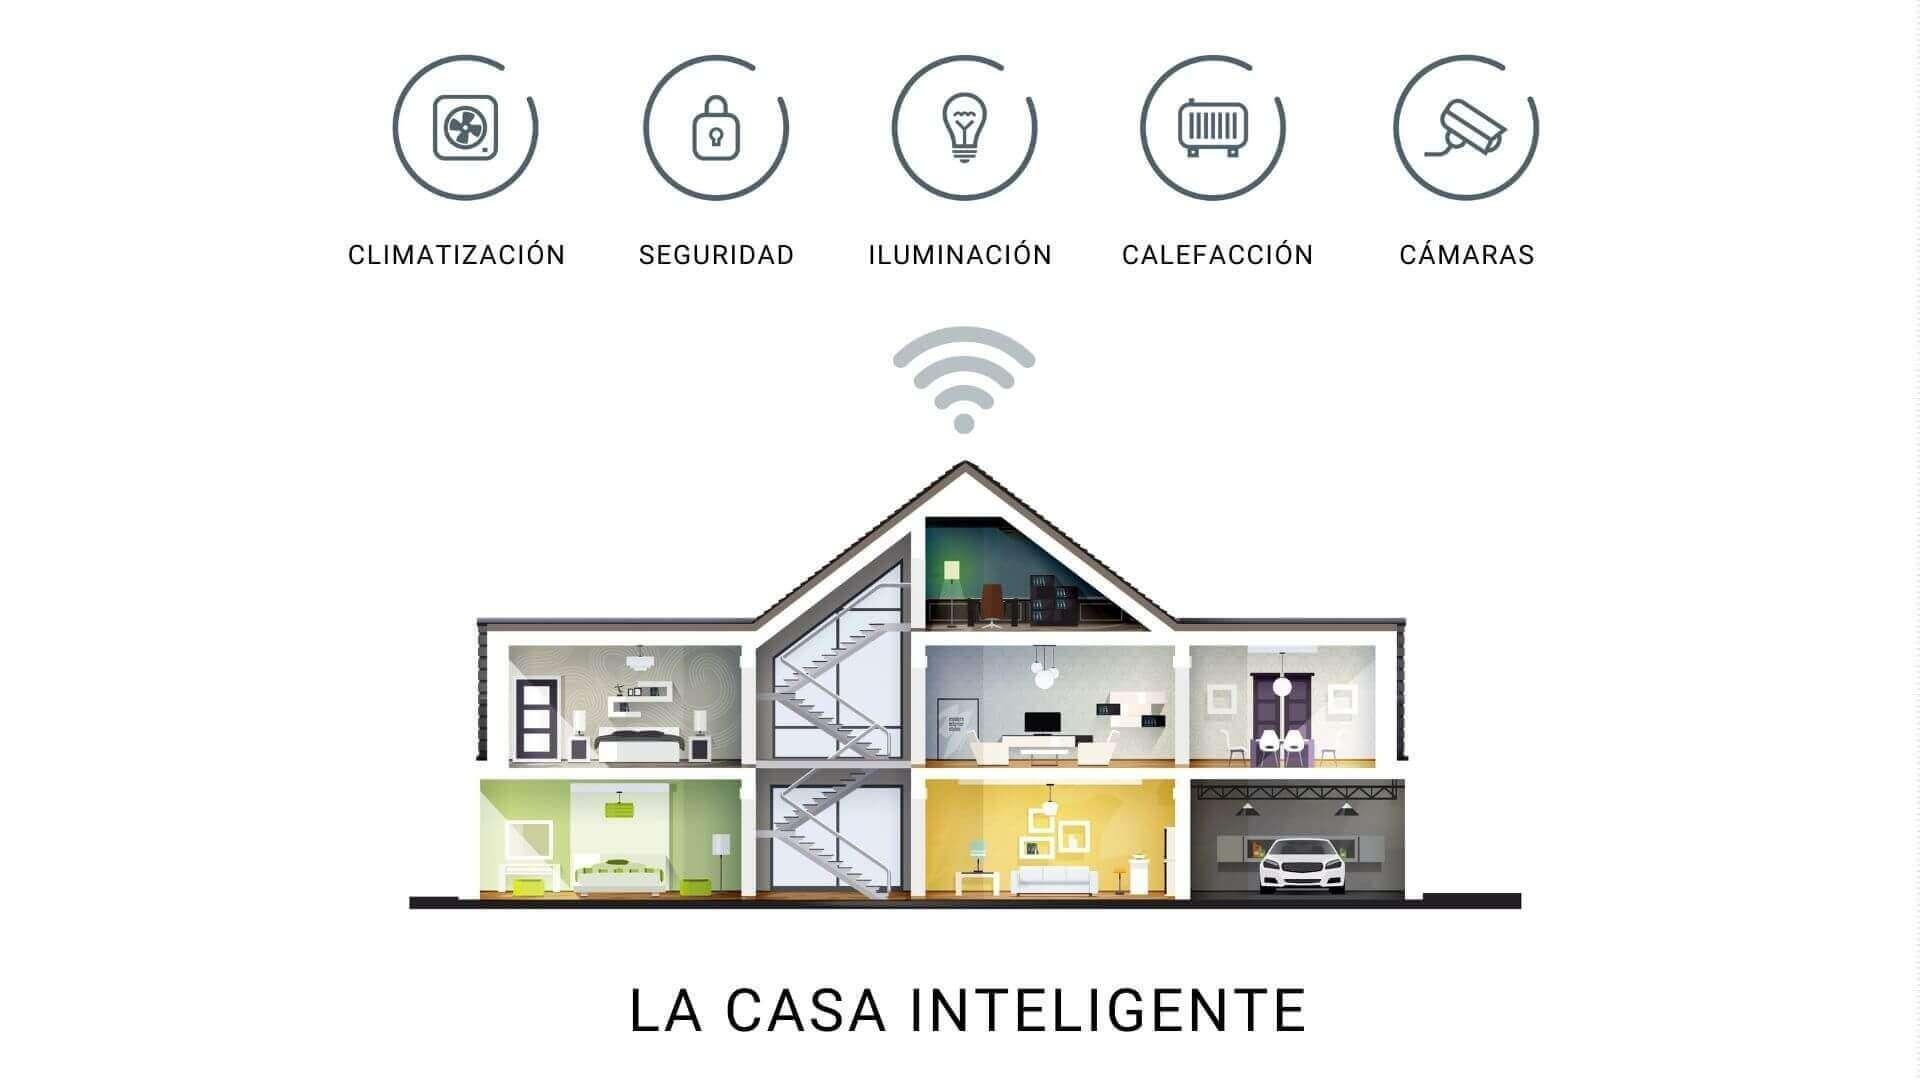 La casa inteligente